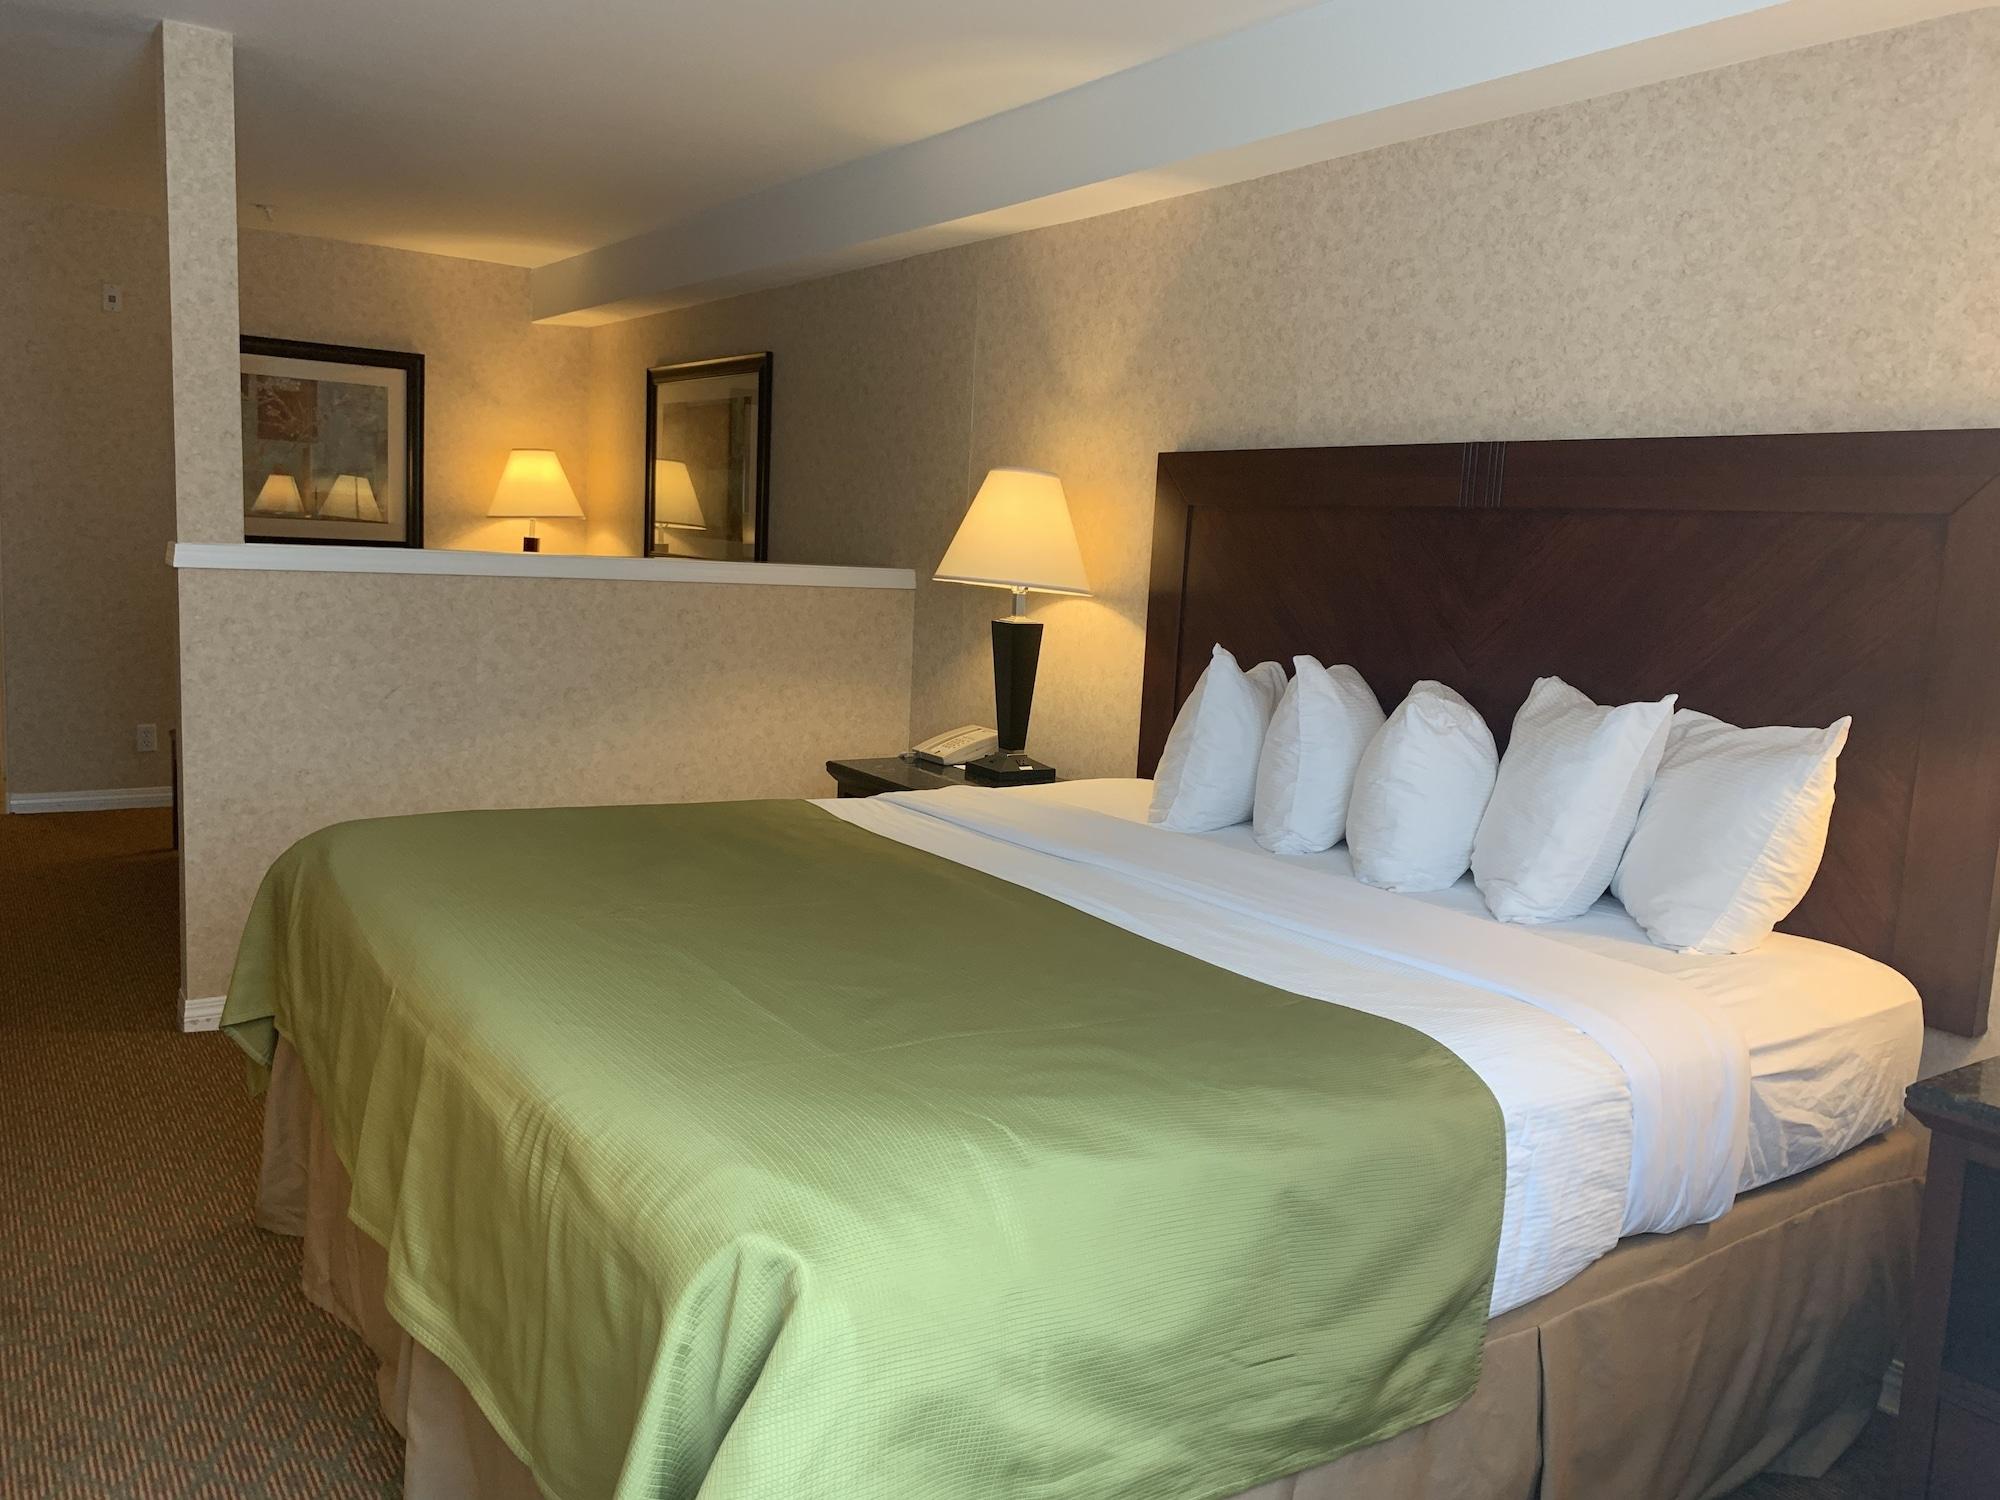 Pacific Inn & Suites, Thompson-Nicola